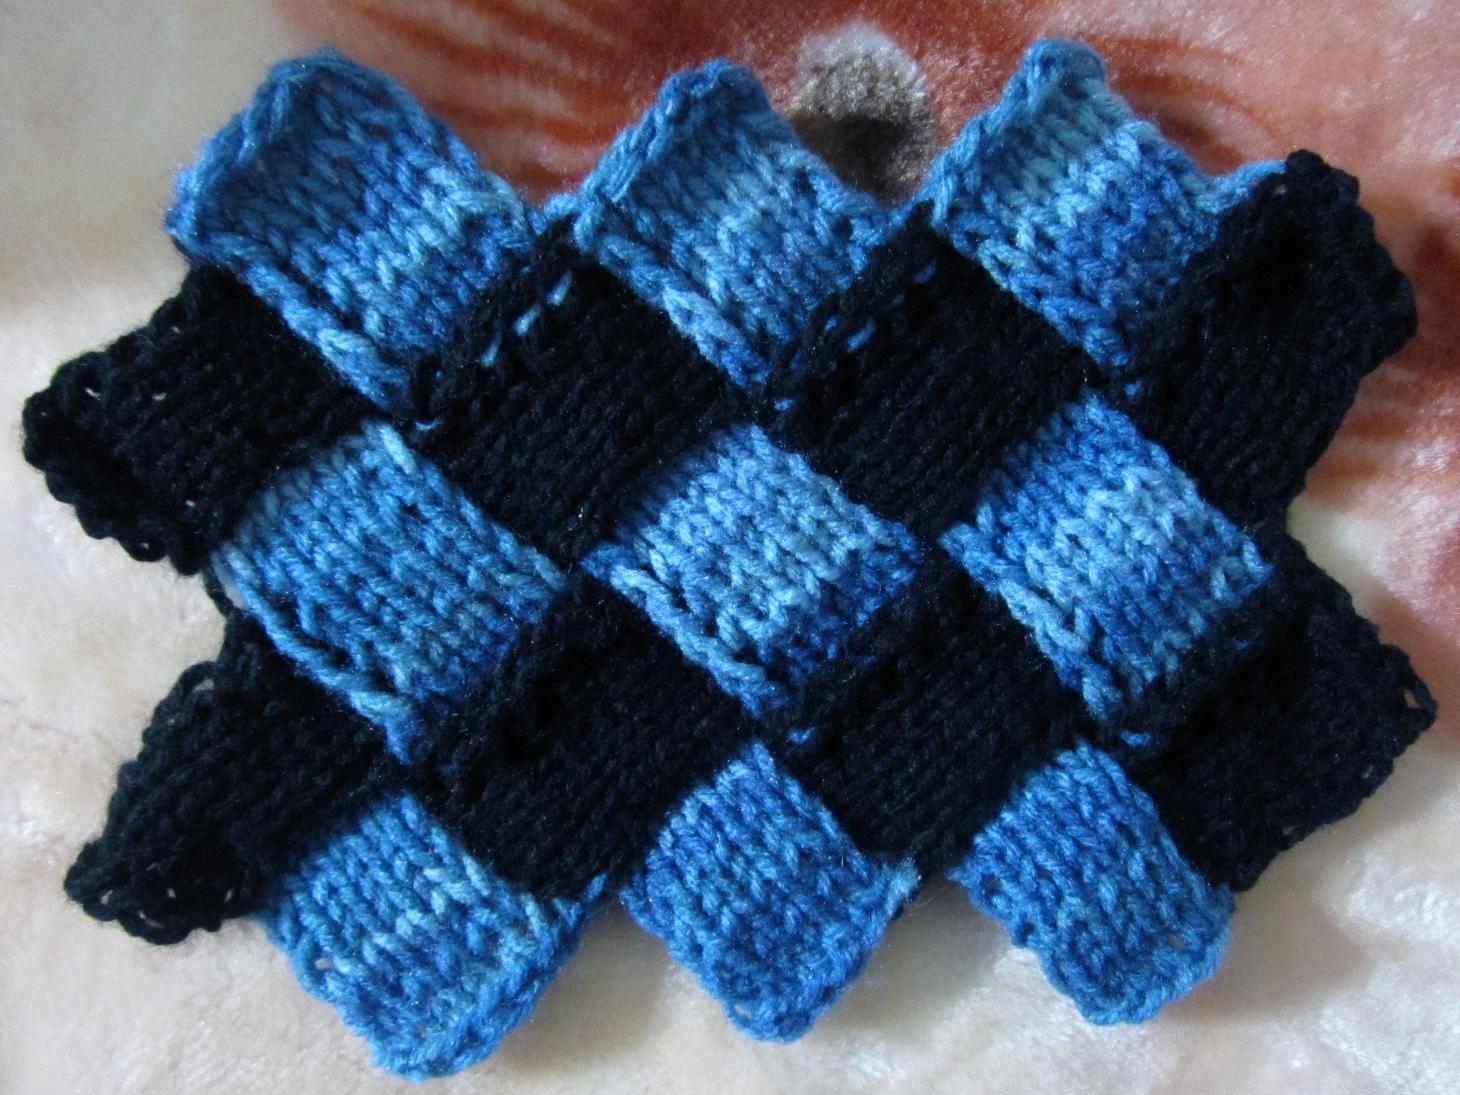 http://www.knittingstitchpatterns.com/2014/11/zig-zag-entrelac.html